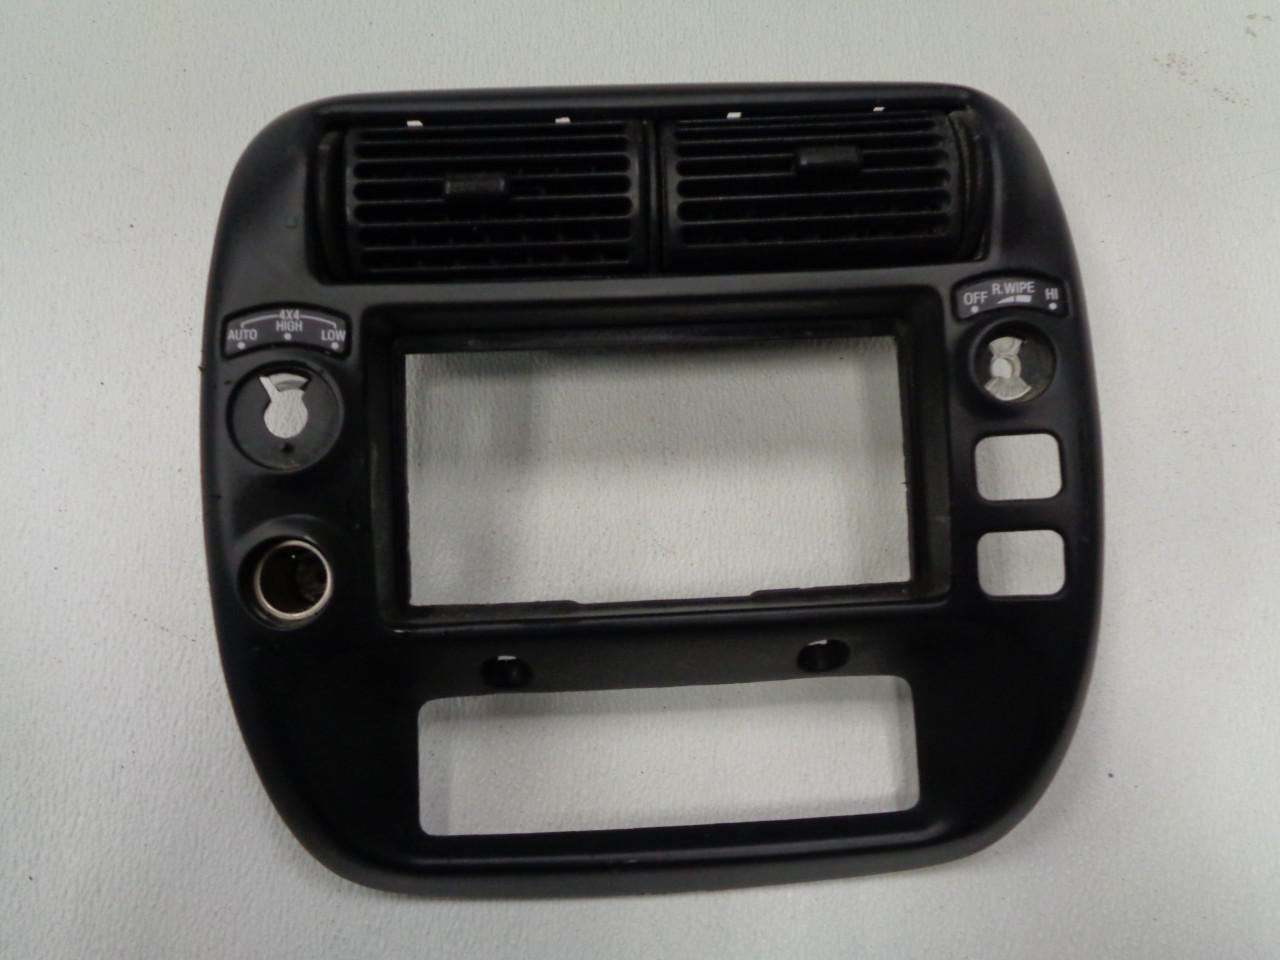 Padholdr Edge Series Premium Tablet Dash Kit for 2006-2010 Ford Explorer//Mercury Mountaineer Pad Holdr PHE75107-206